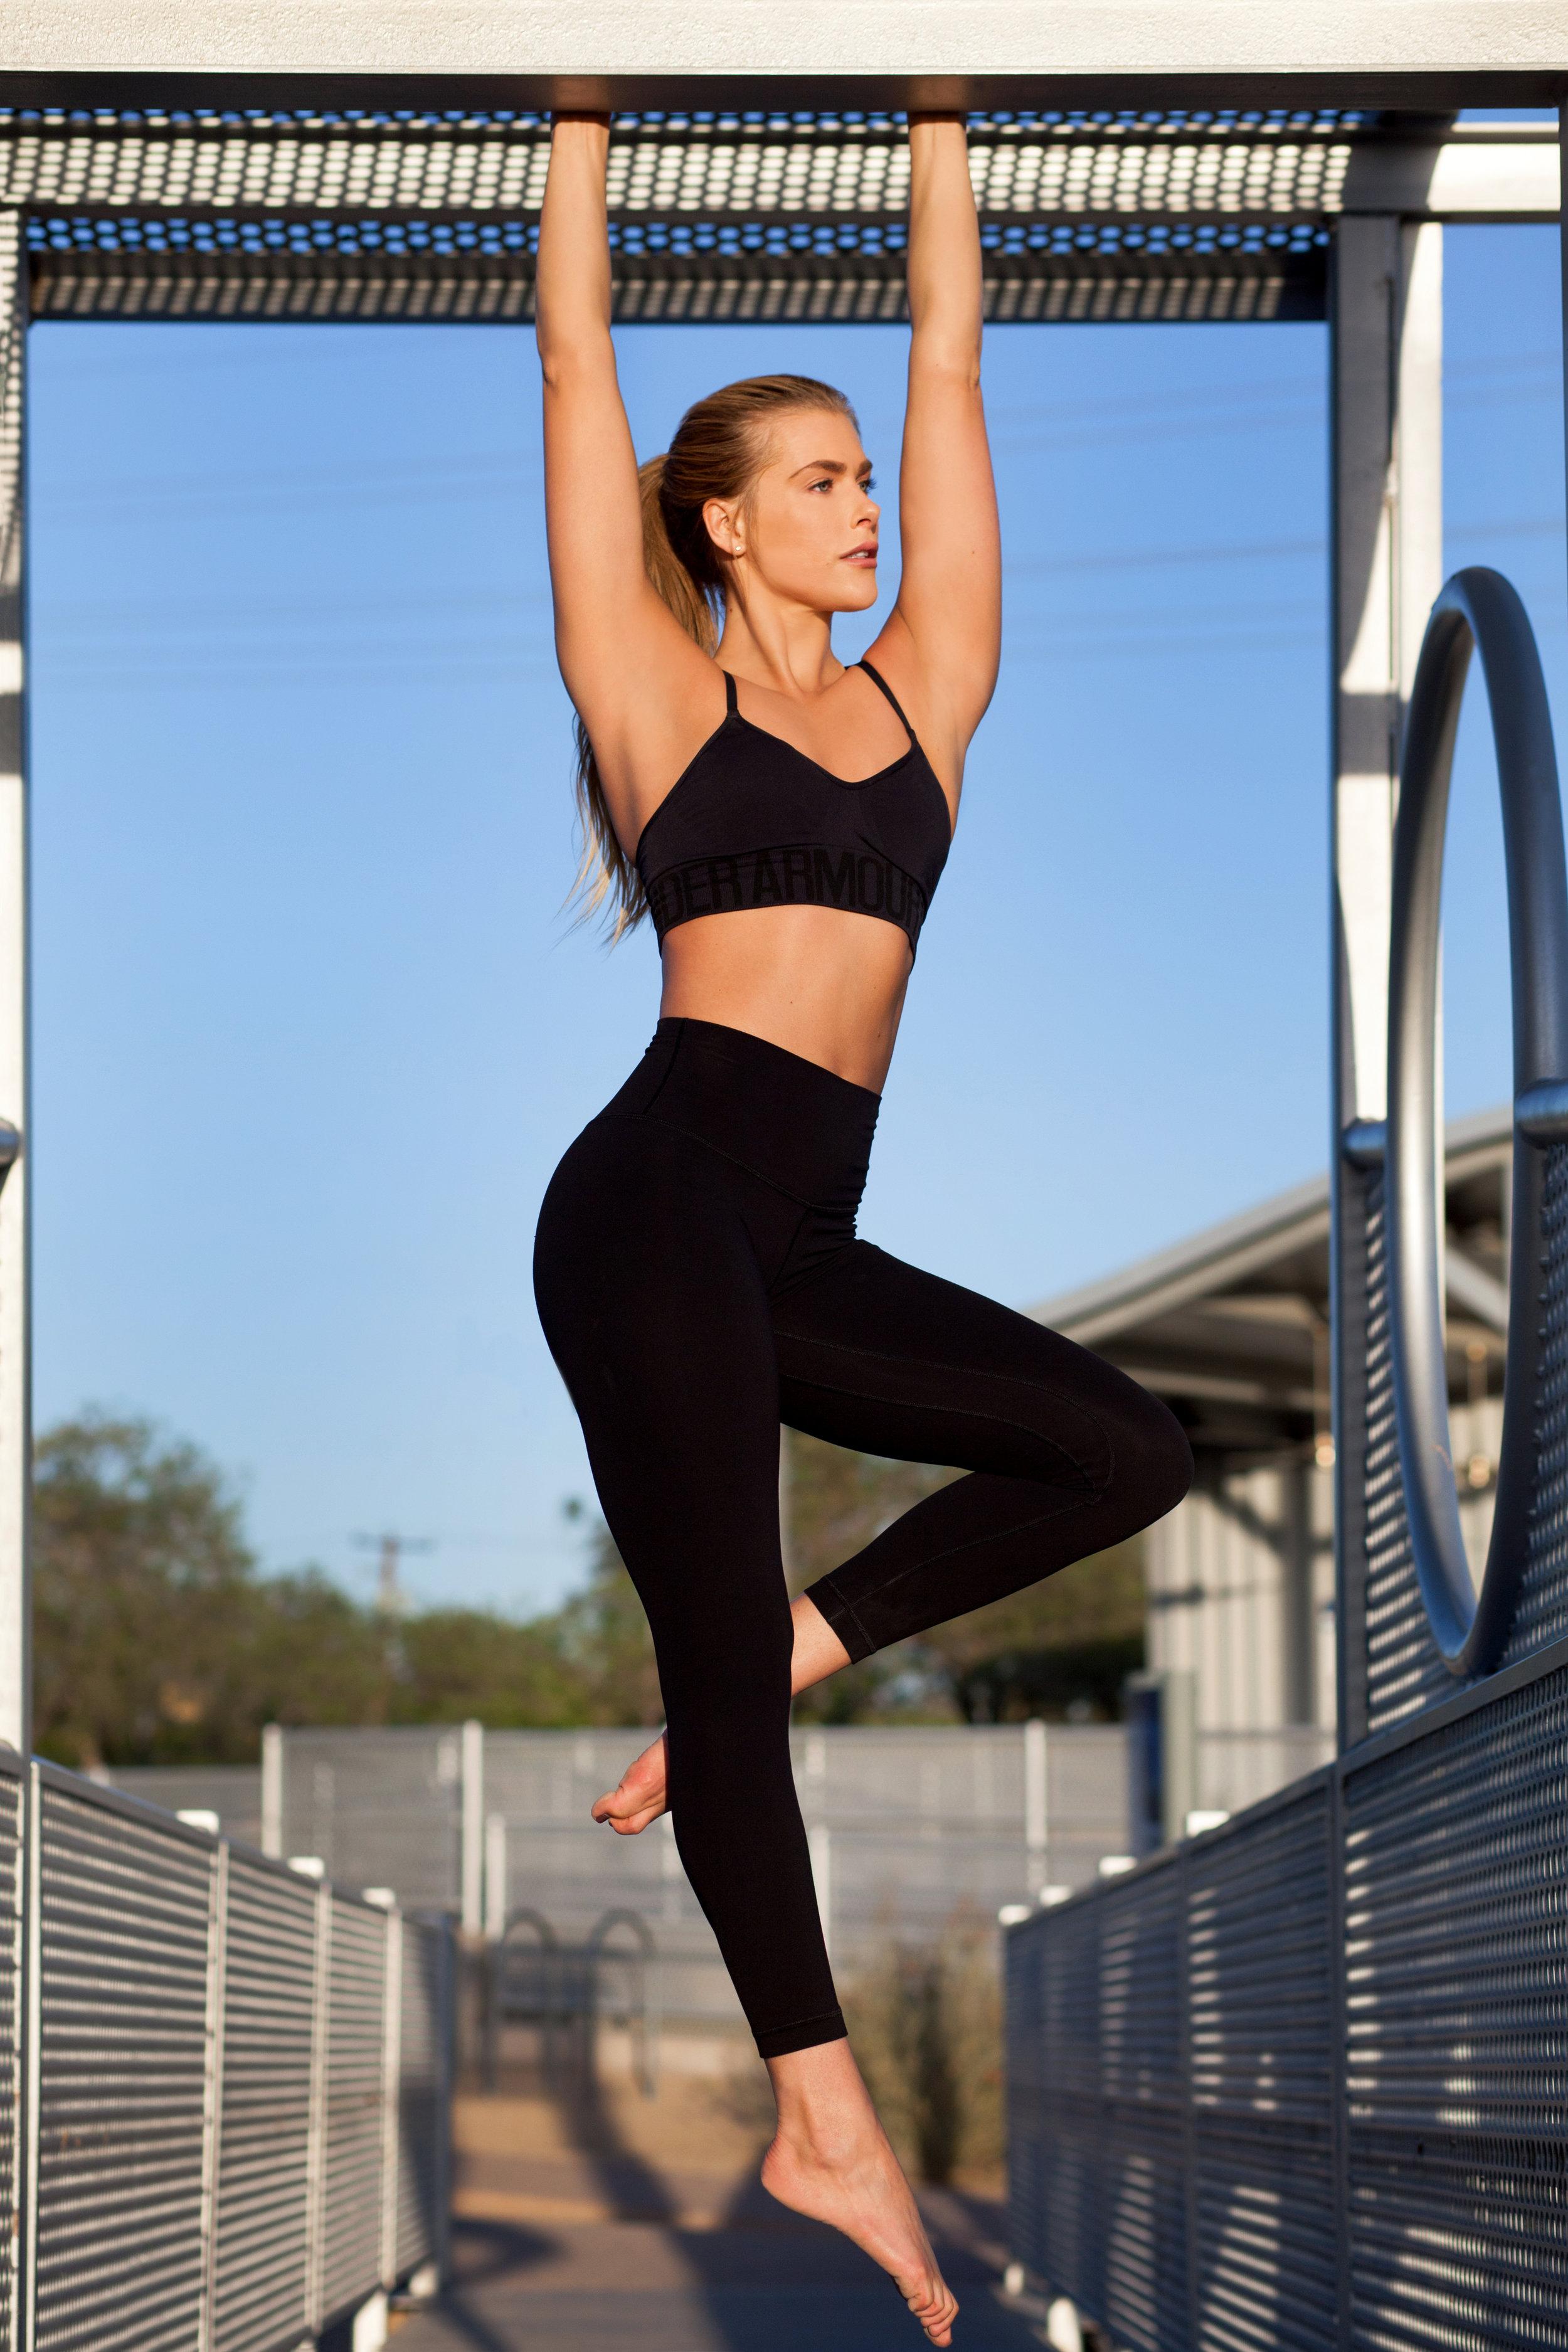 WEB_Anderson Fitness Model-0389.JPG